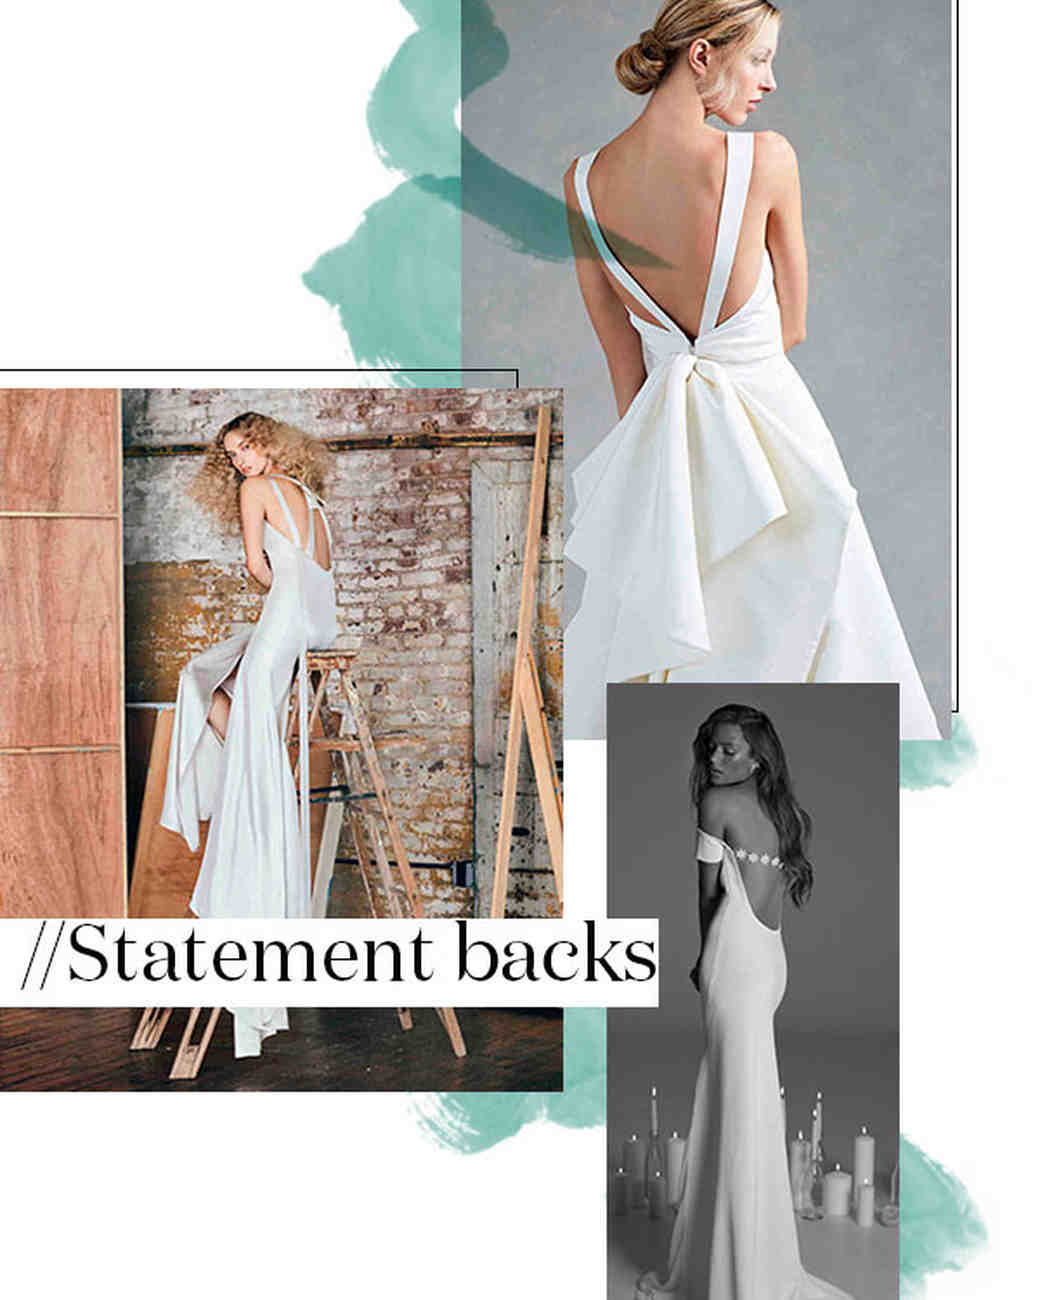 Fall 2017 Wedding Dress Trend: Statement Backs